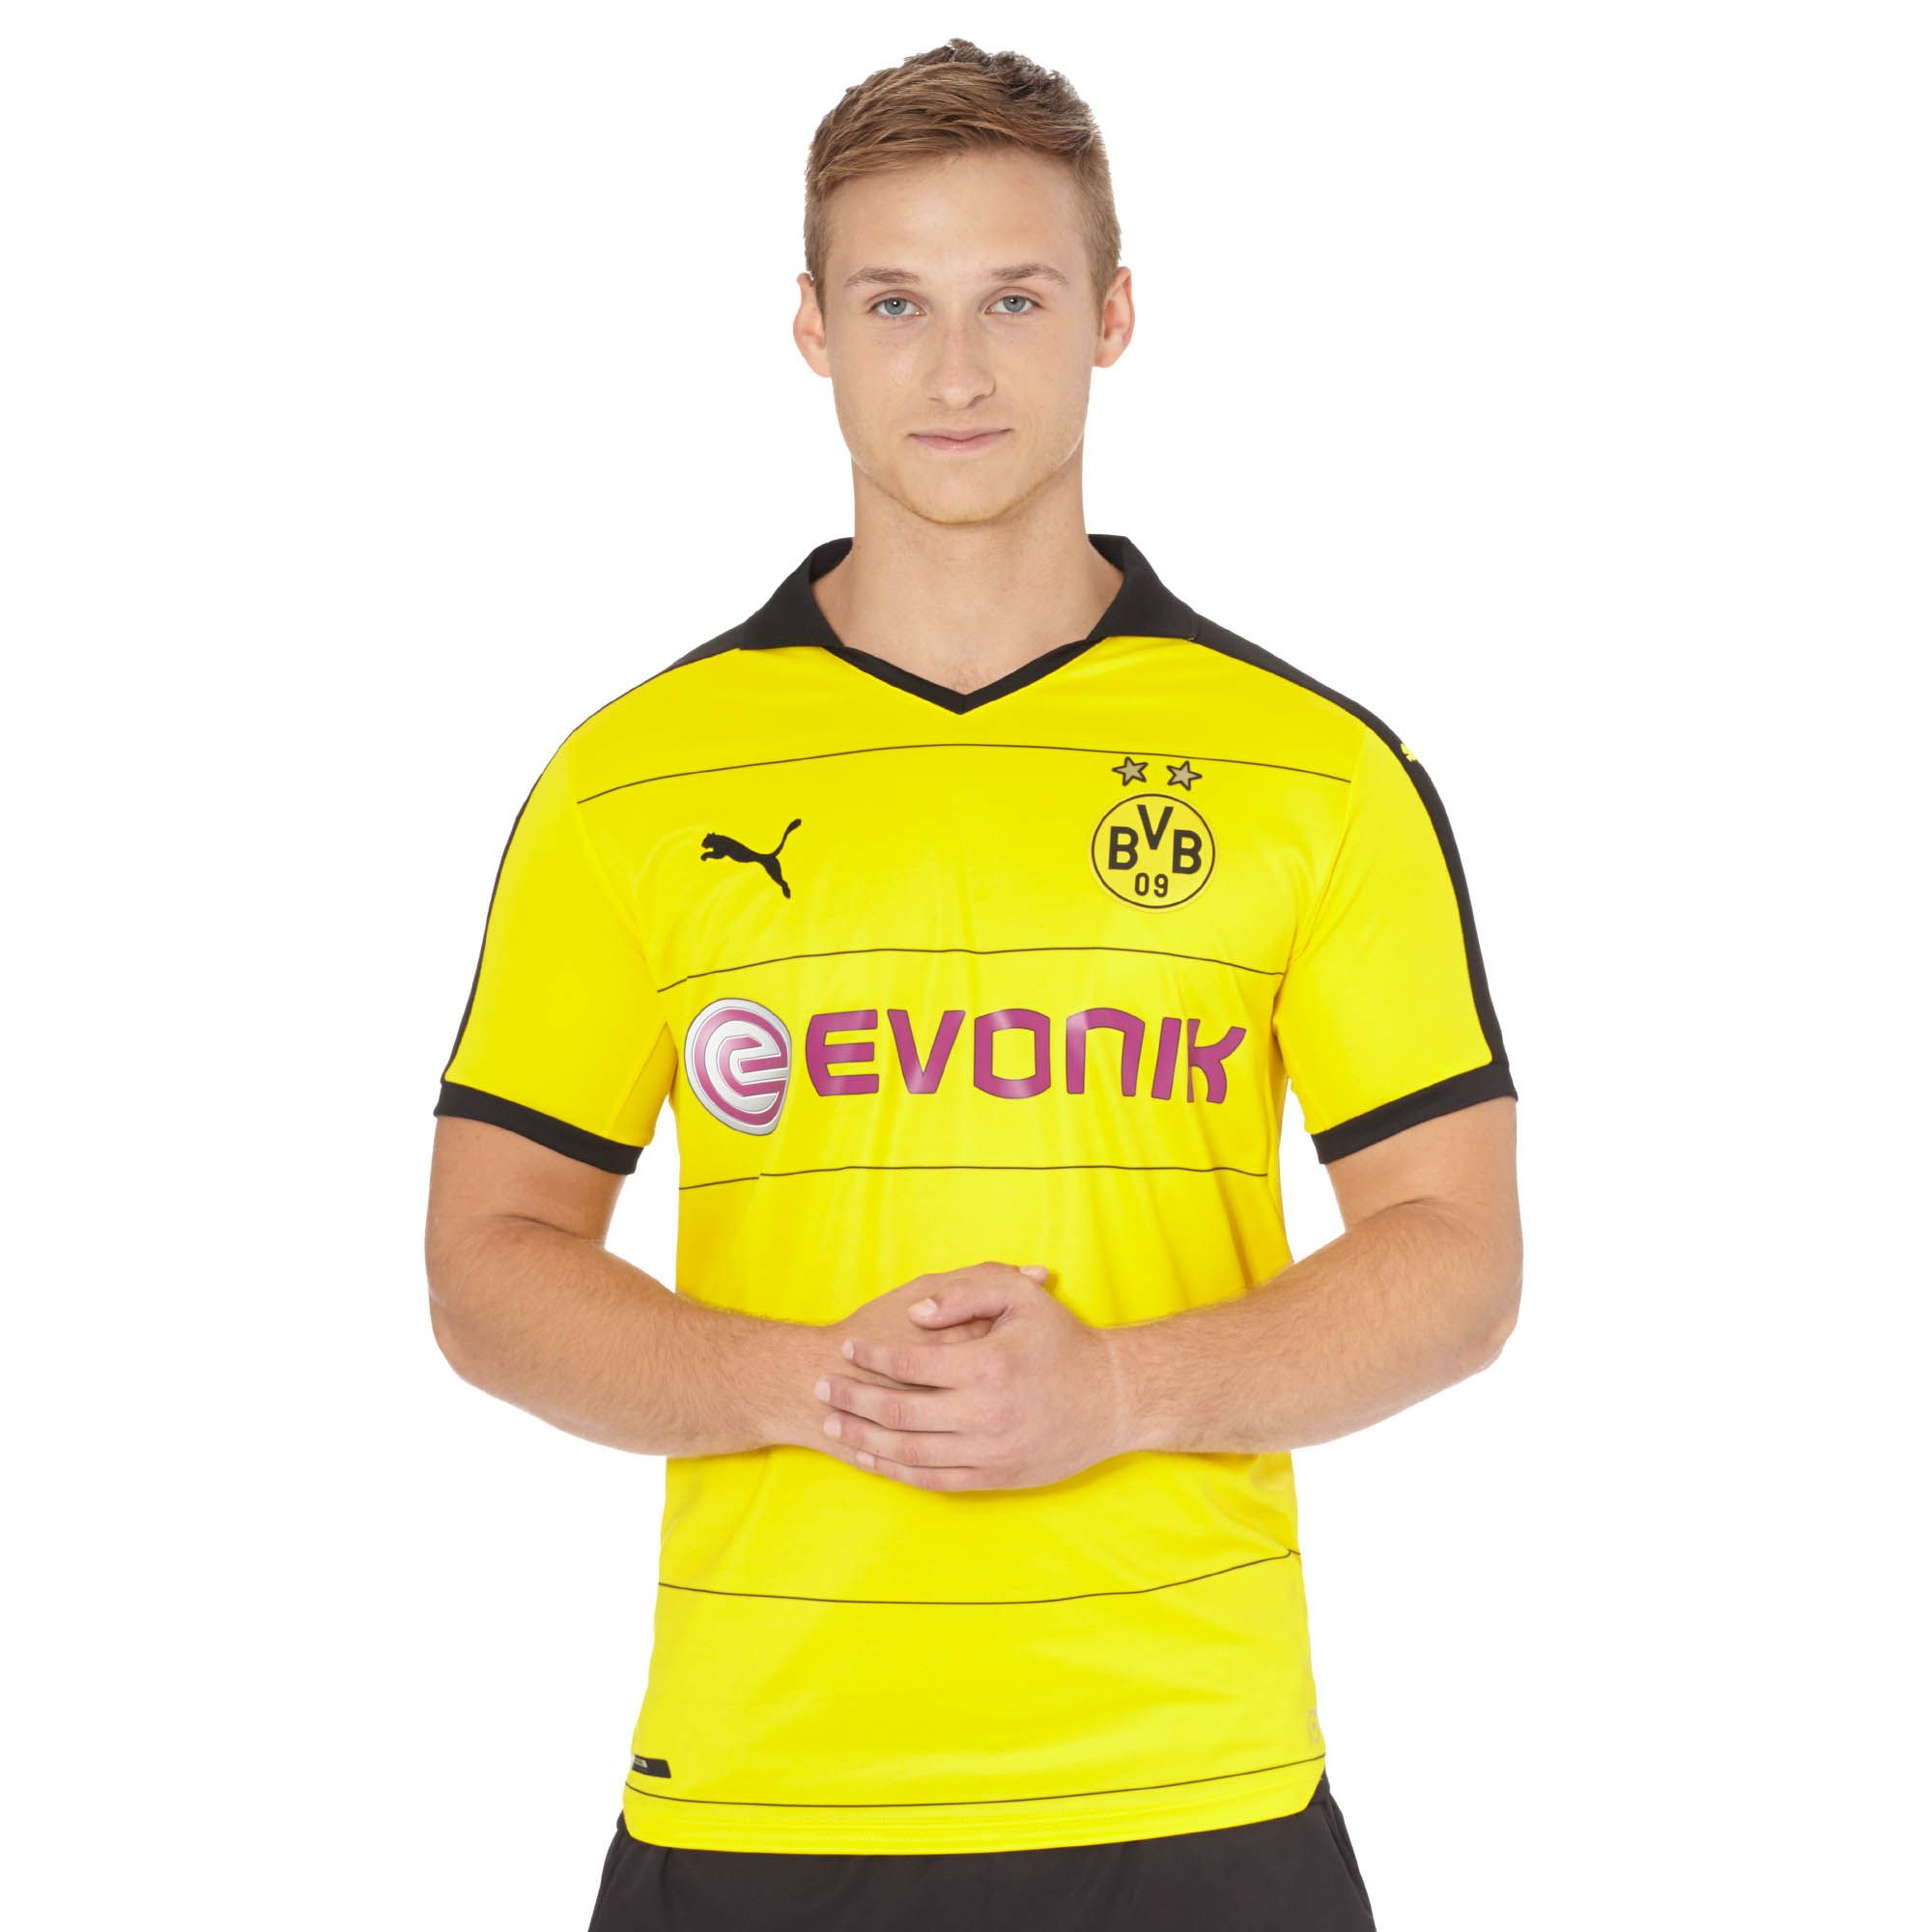 Image of 2015/16 Borussia Dortmund Home Replica Jersey